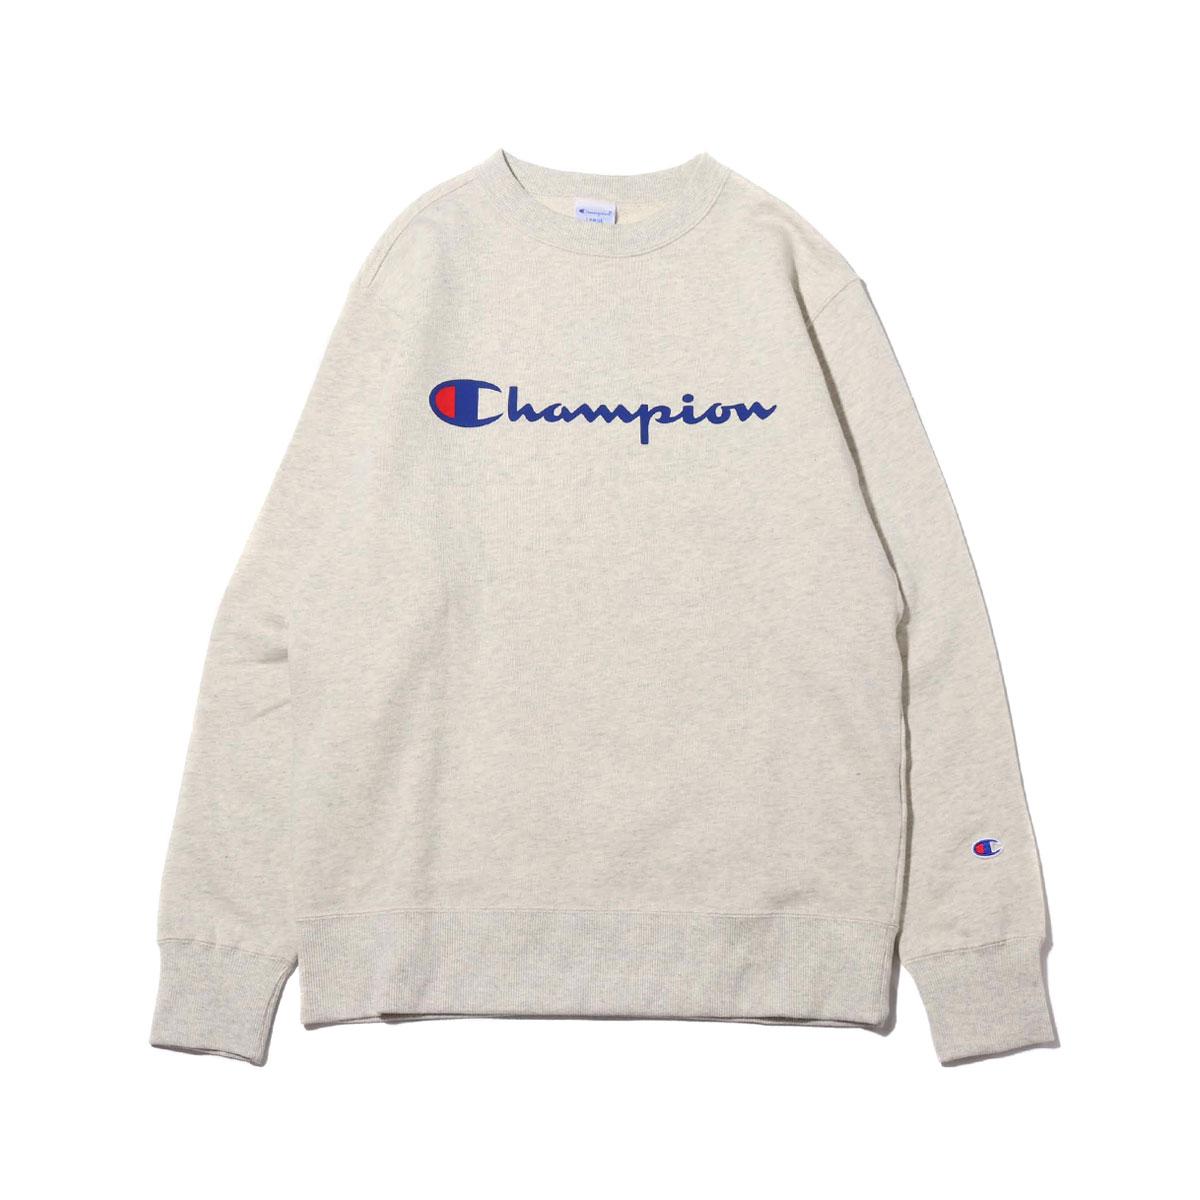 19b28292d Champion CREW NECK SWEATSHIRT (oatmeal) (champion crew neck sweat shirt) ...